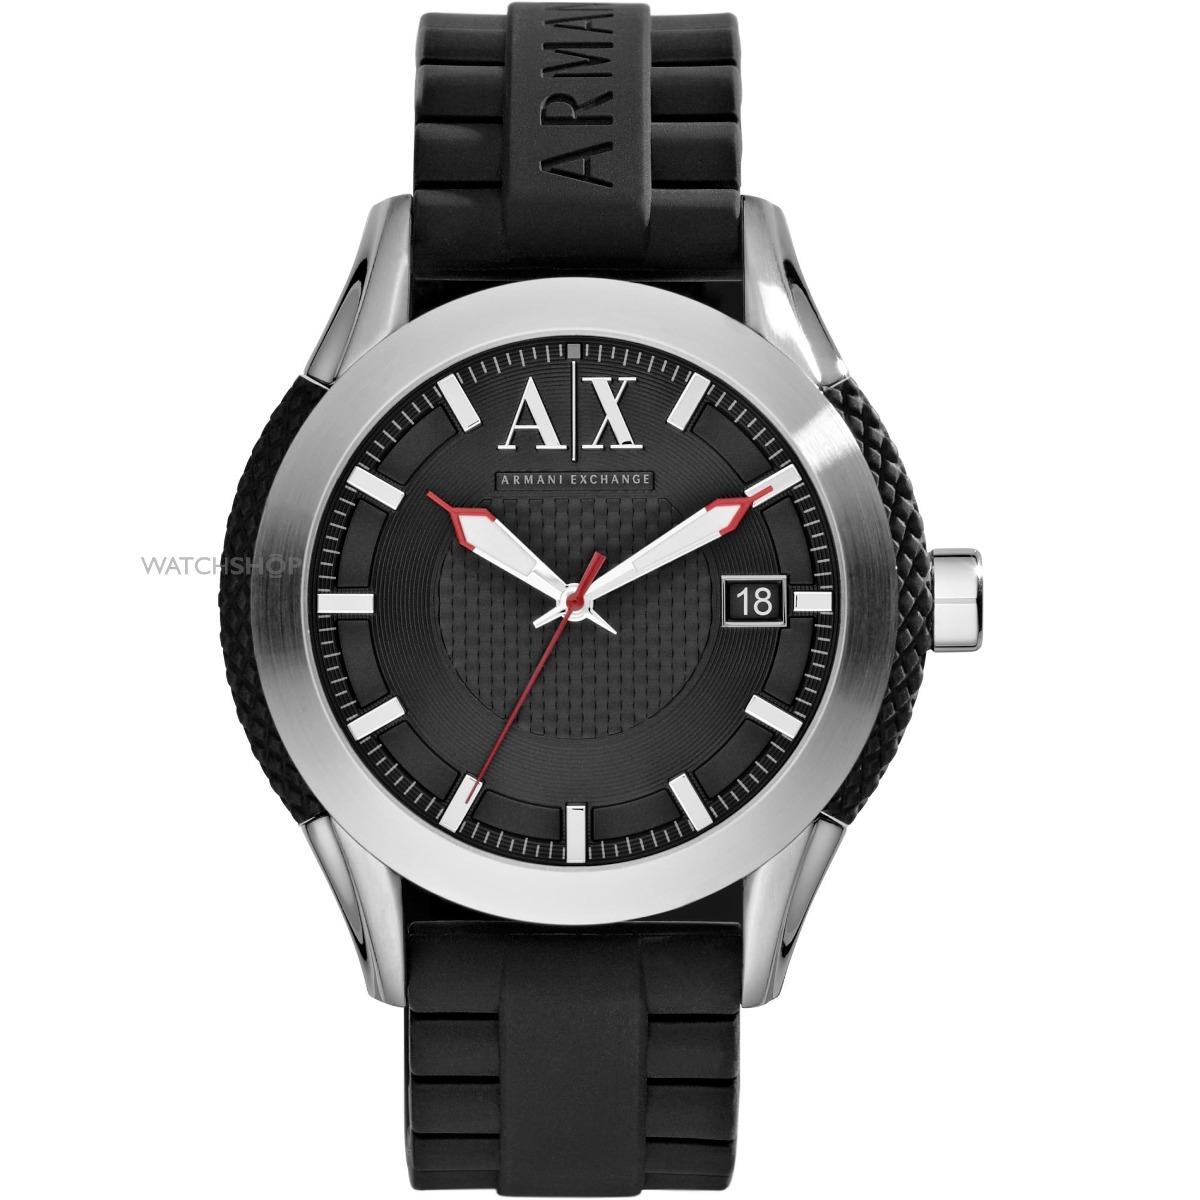 8e2c25fc6fe relógio masculino armani exchange ax1226 original garantia. Carregando zoom.